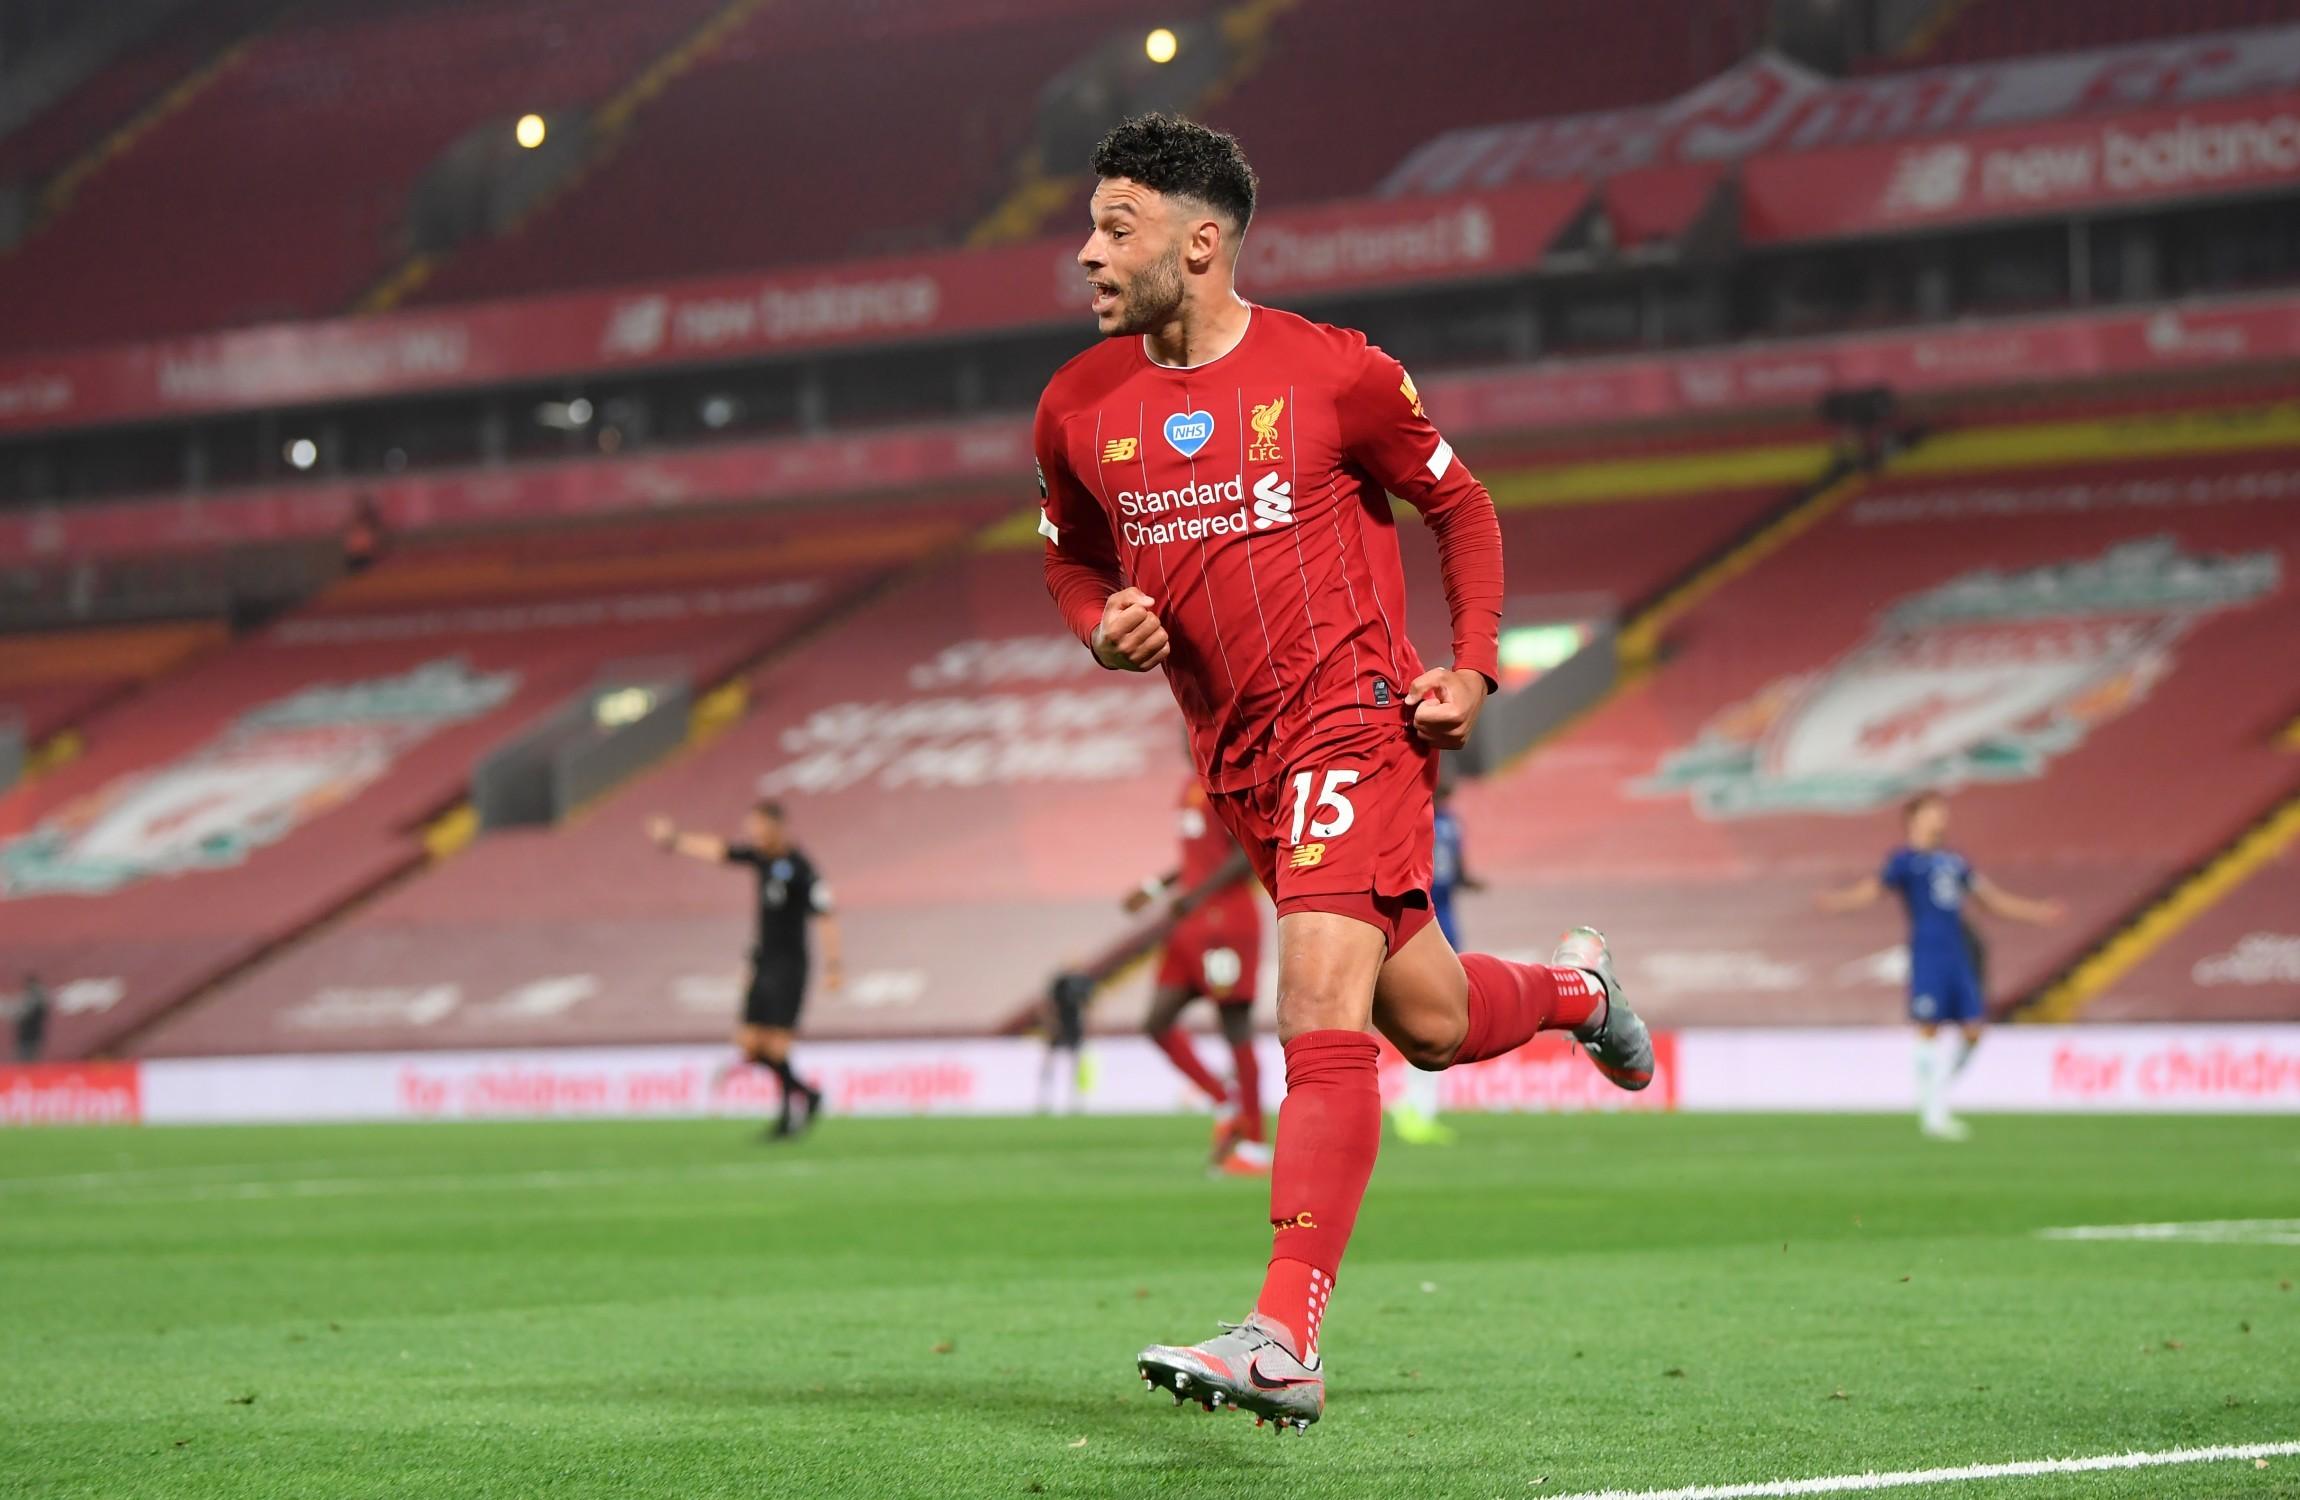 Liverpool boss Jurgen Klopp confirms Diogo Jota injury concern ahead of Fulham